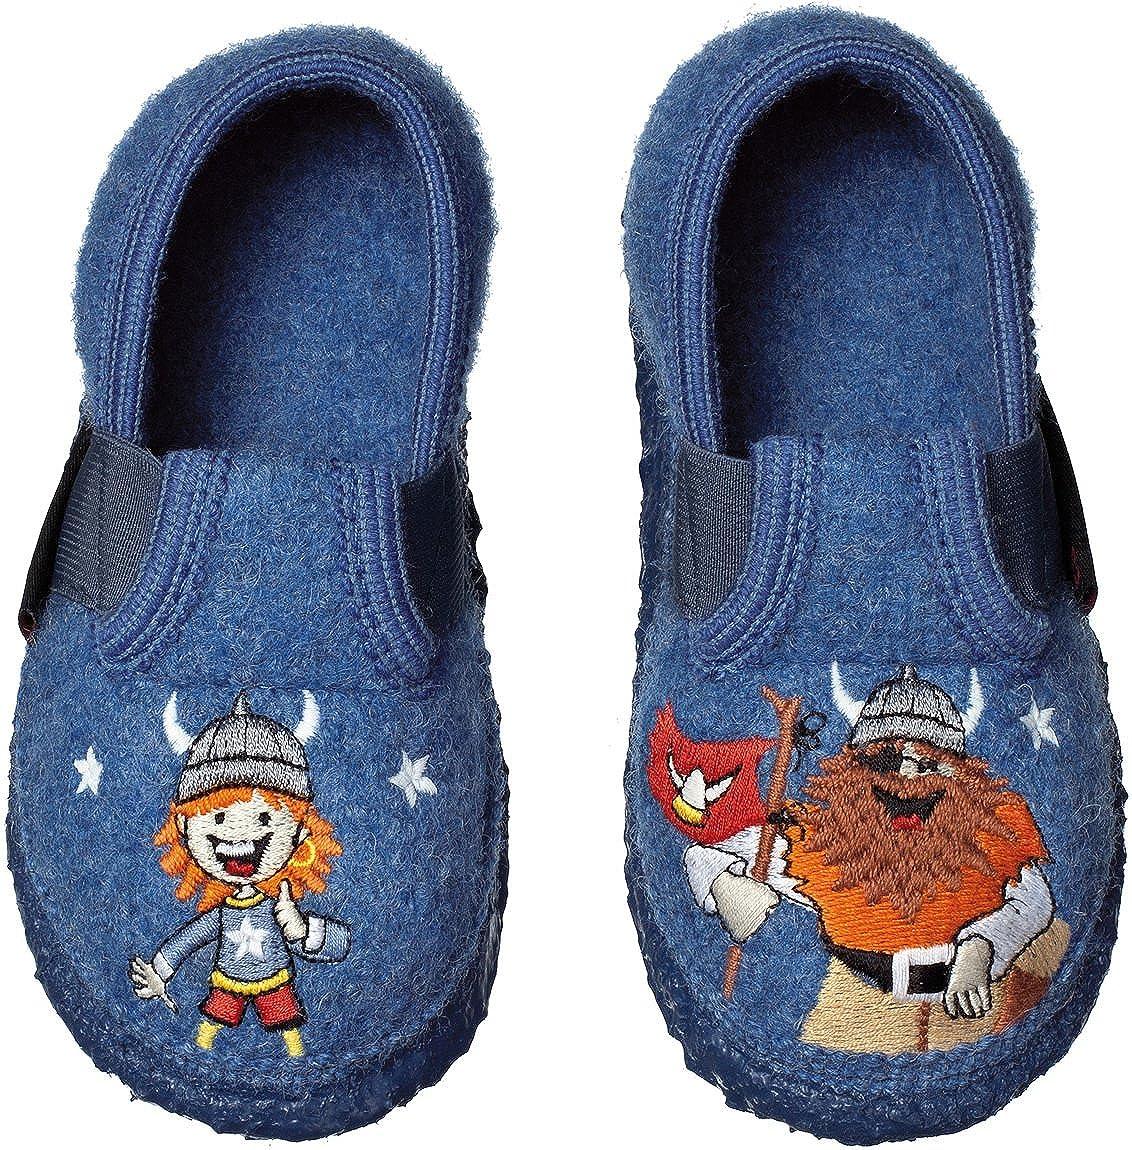 ONEYUAN Children Humor Kitties cat Kid Casual Lightweight Sport Shoes Sneakers Running Shoes